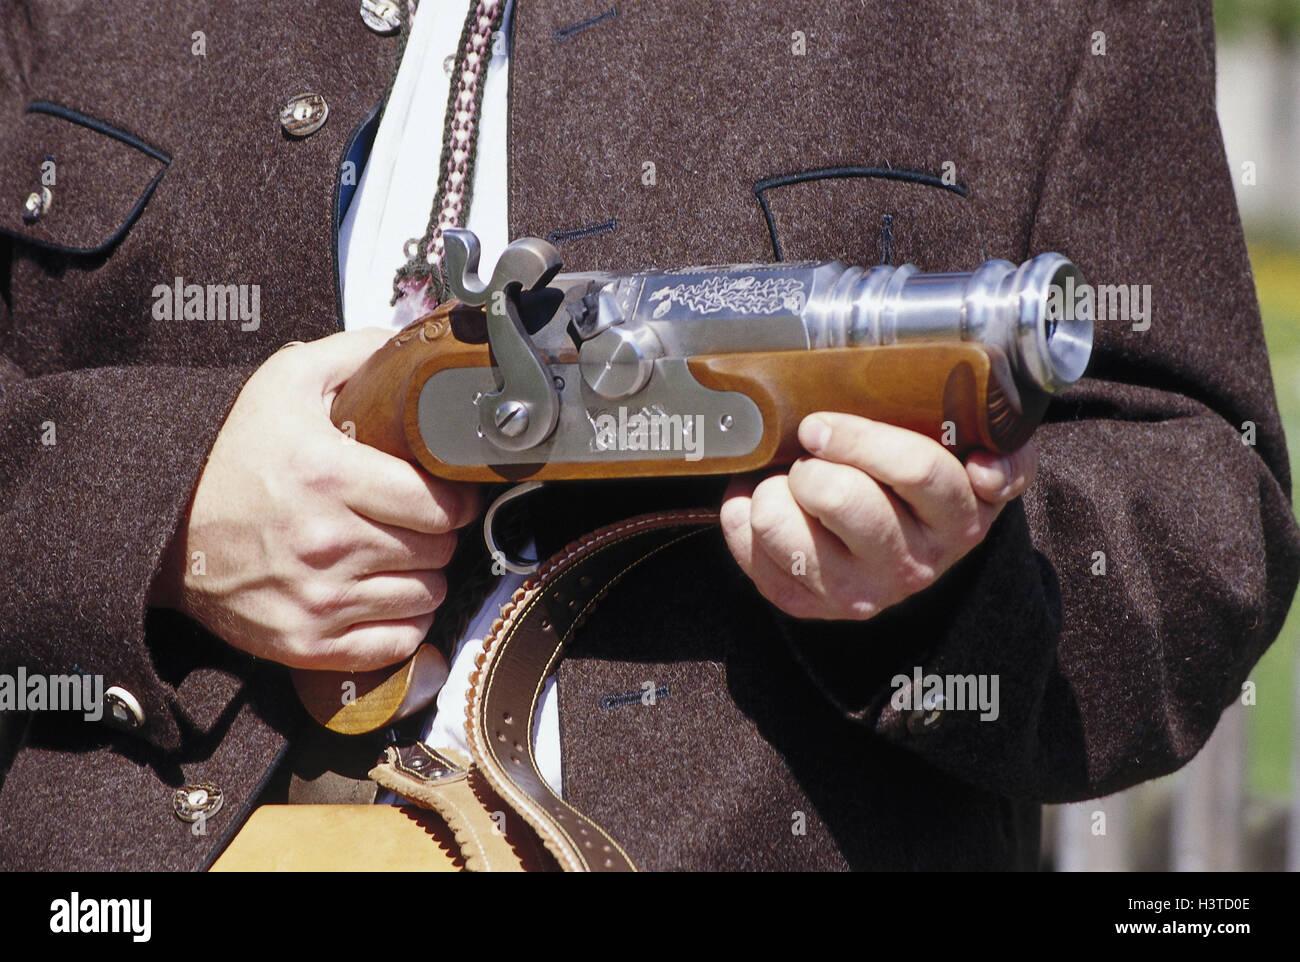 Germany, Bavaria, Chiemgau, goal spree, man, detail, hand saluting gun, outside, contactors, saluting guns, weapon, - Stock Image